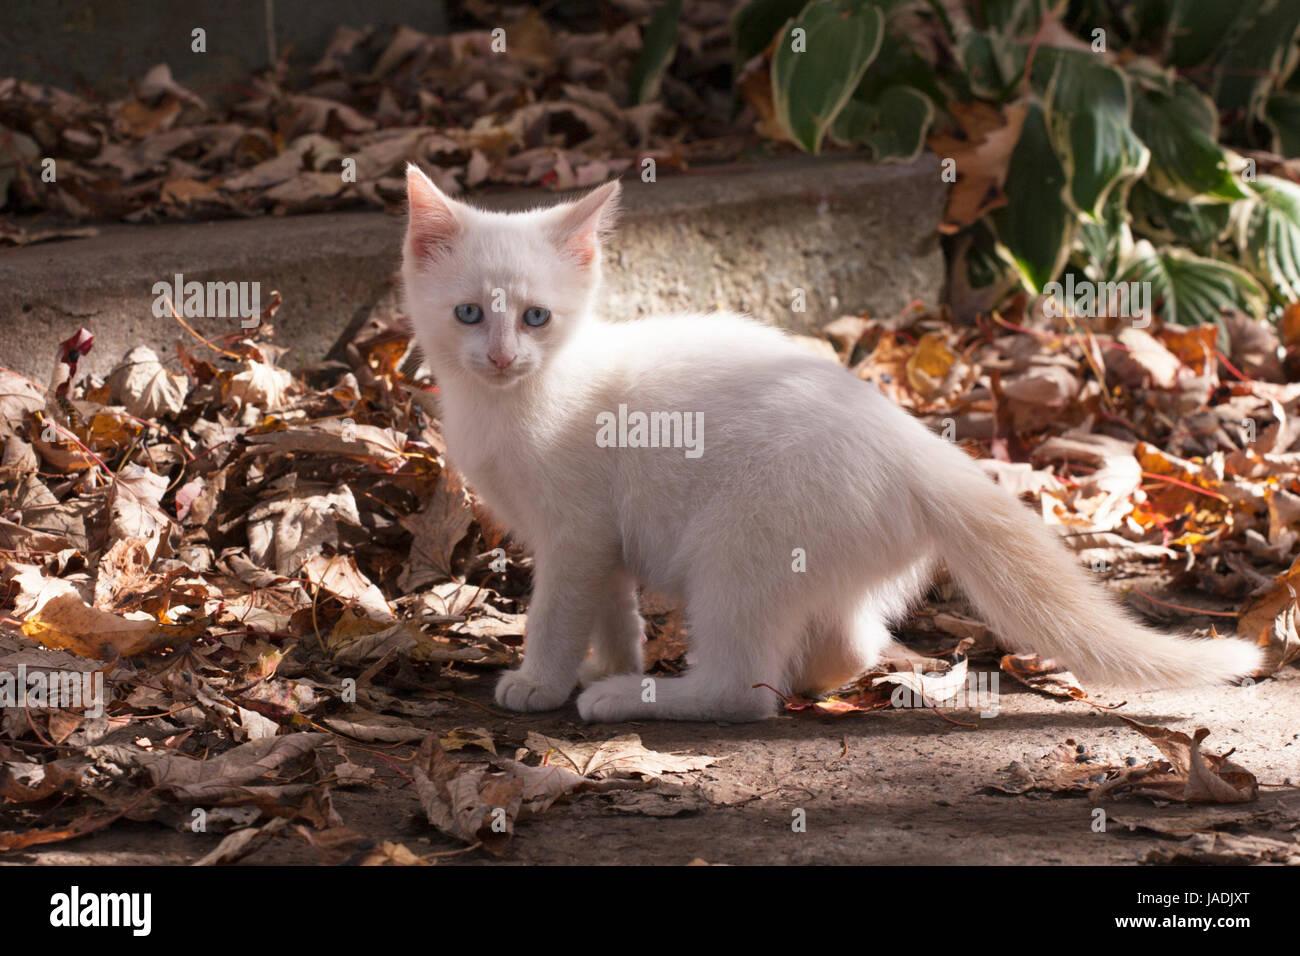 Blue-eyed white kitten among fallen leaves outdoors in autumn - Stock Image